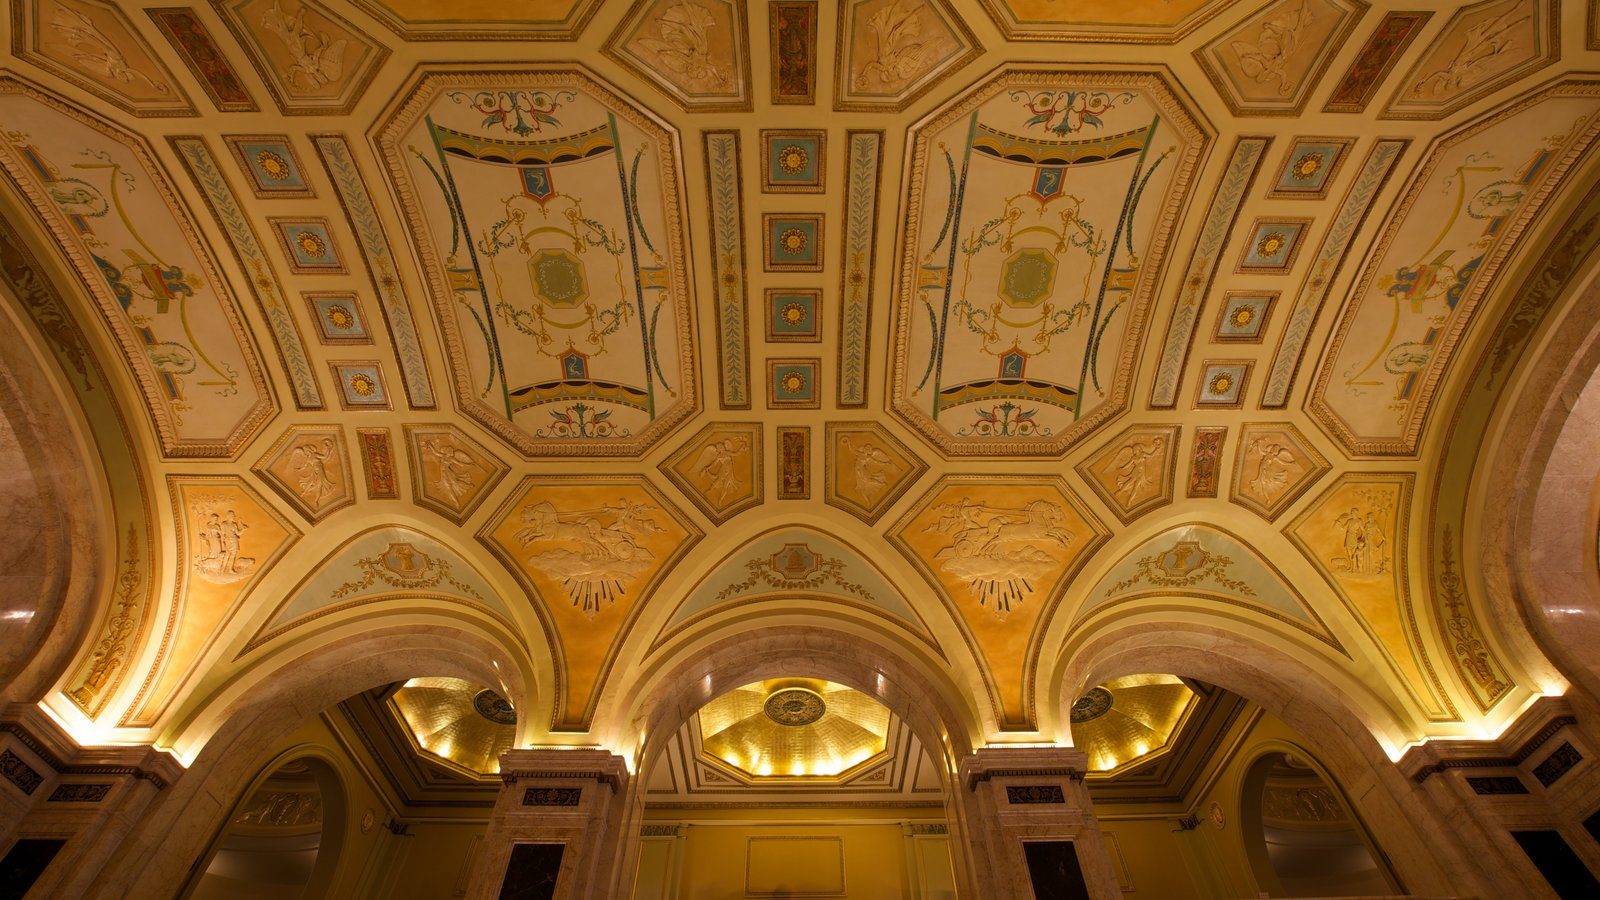 Hershey Theater caracterizando cenas de teatro, vistas internas e arquitetura de patrimônio